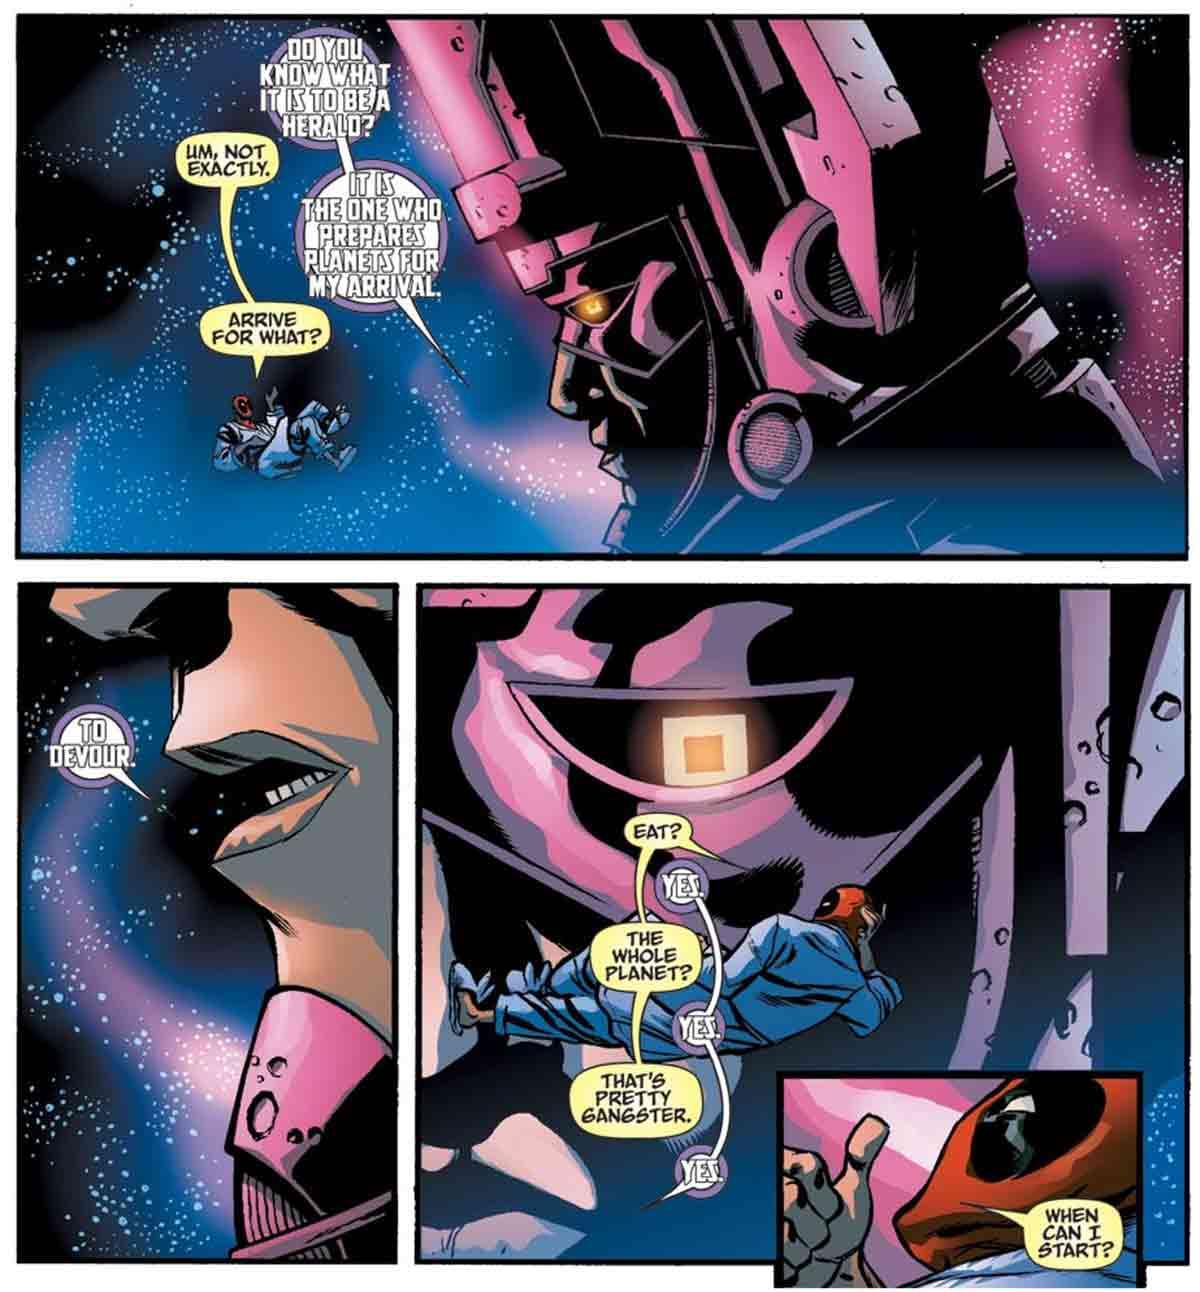 Deadpool se enfrentará a un villano muy poderoso en las películas de Marvel